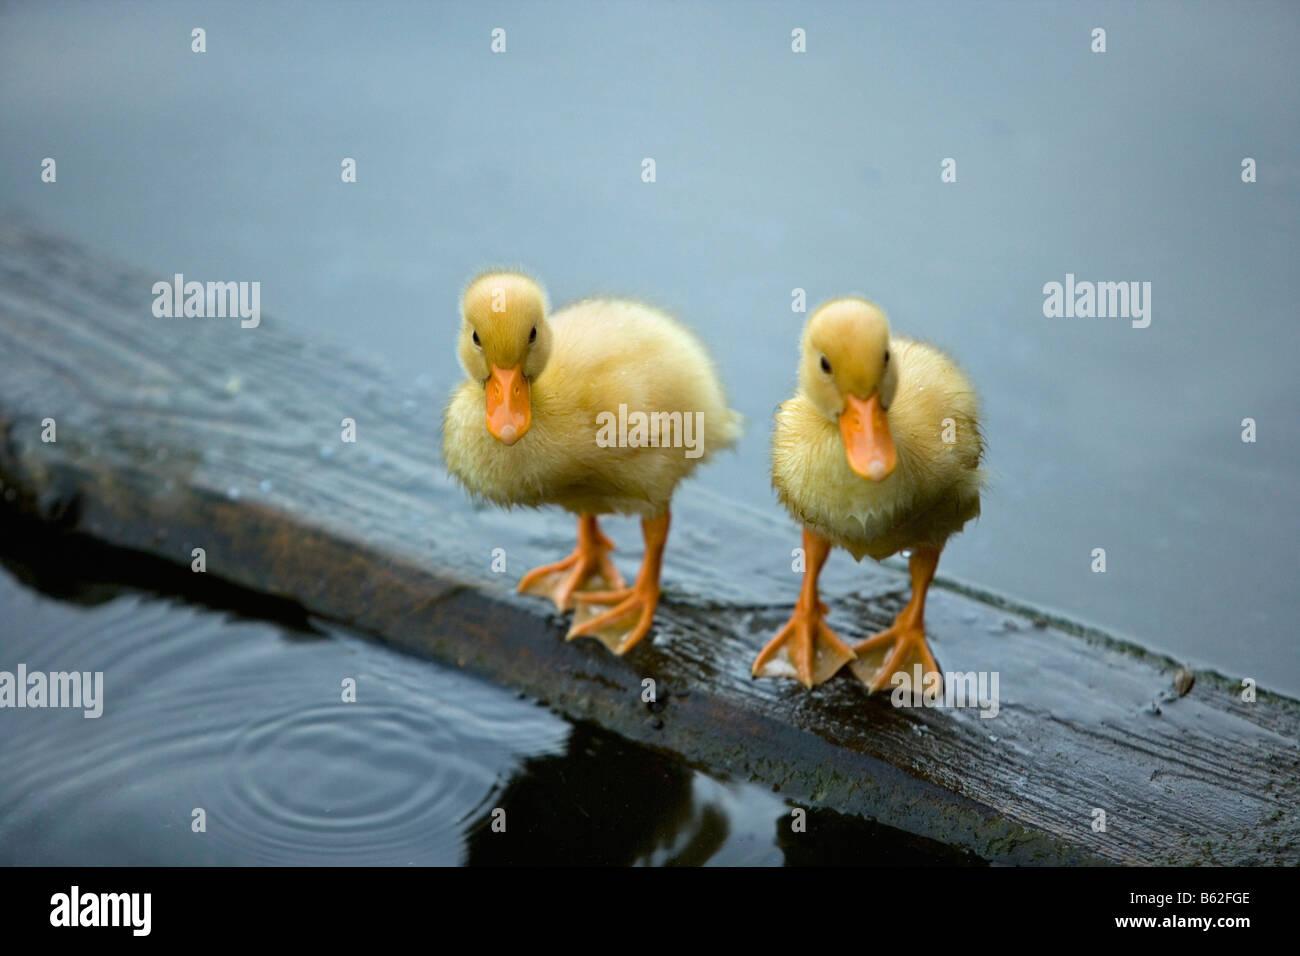 Netherlands, Noord Holland, Graveland, Wild duck chicks on board. - Stock Image